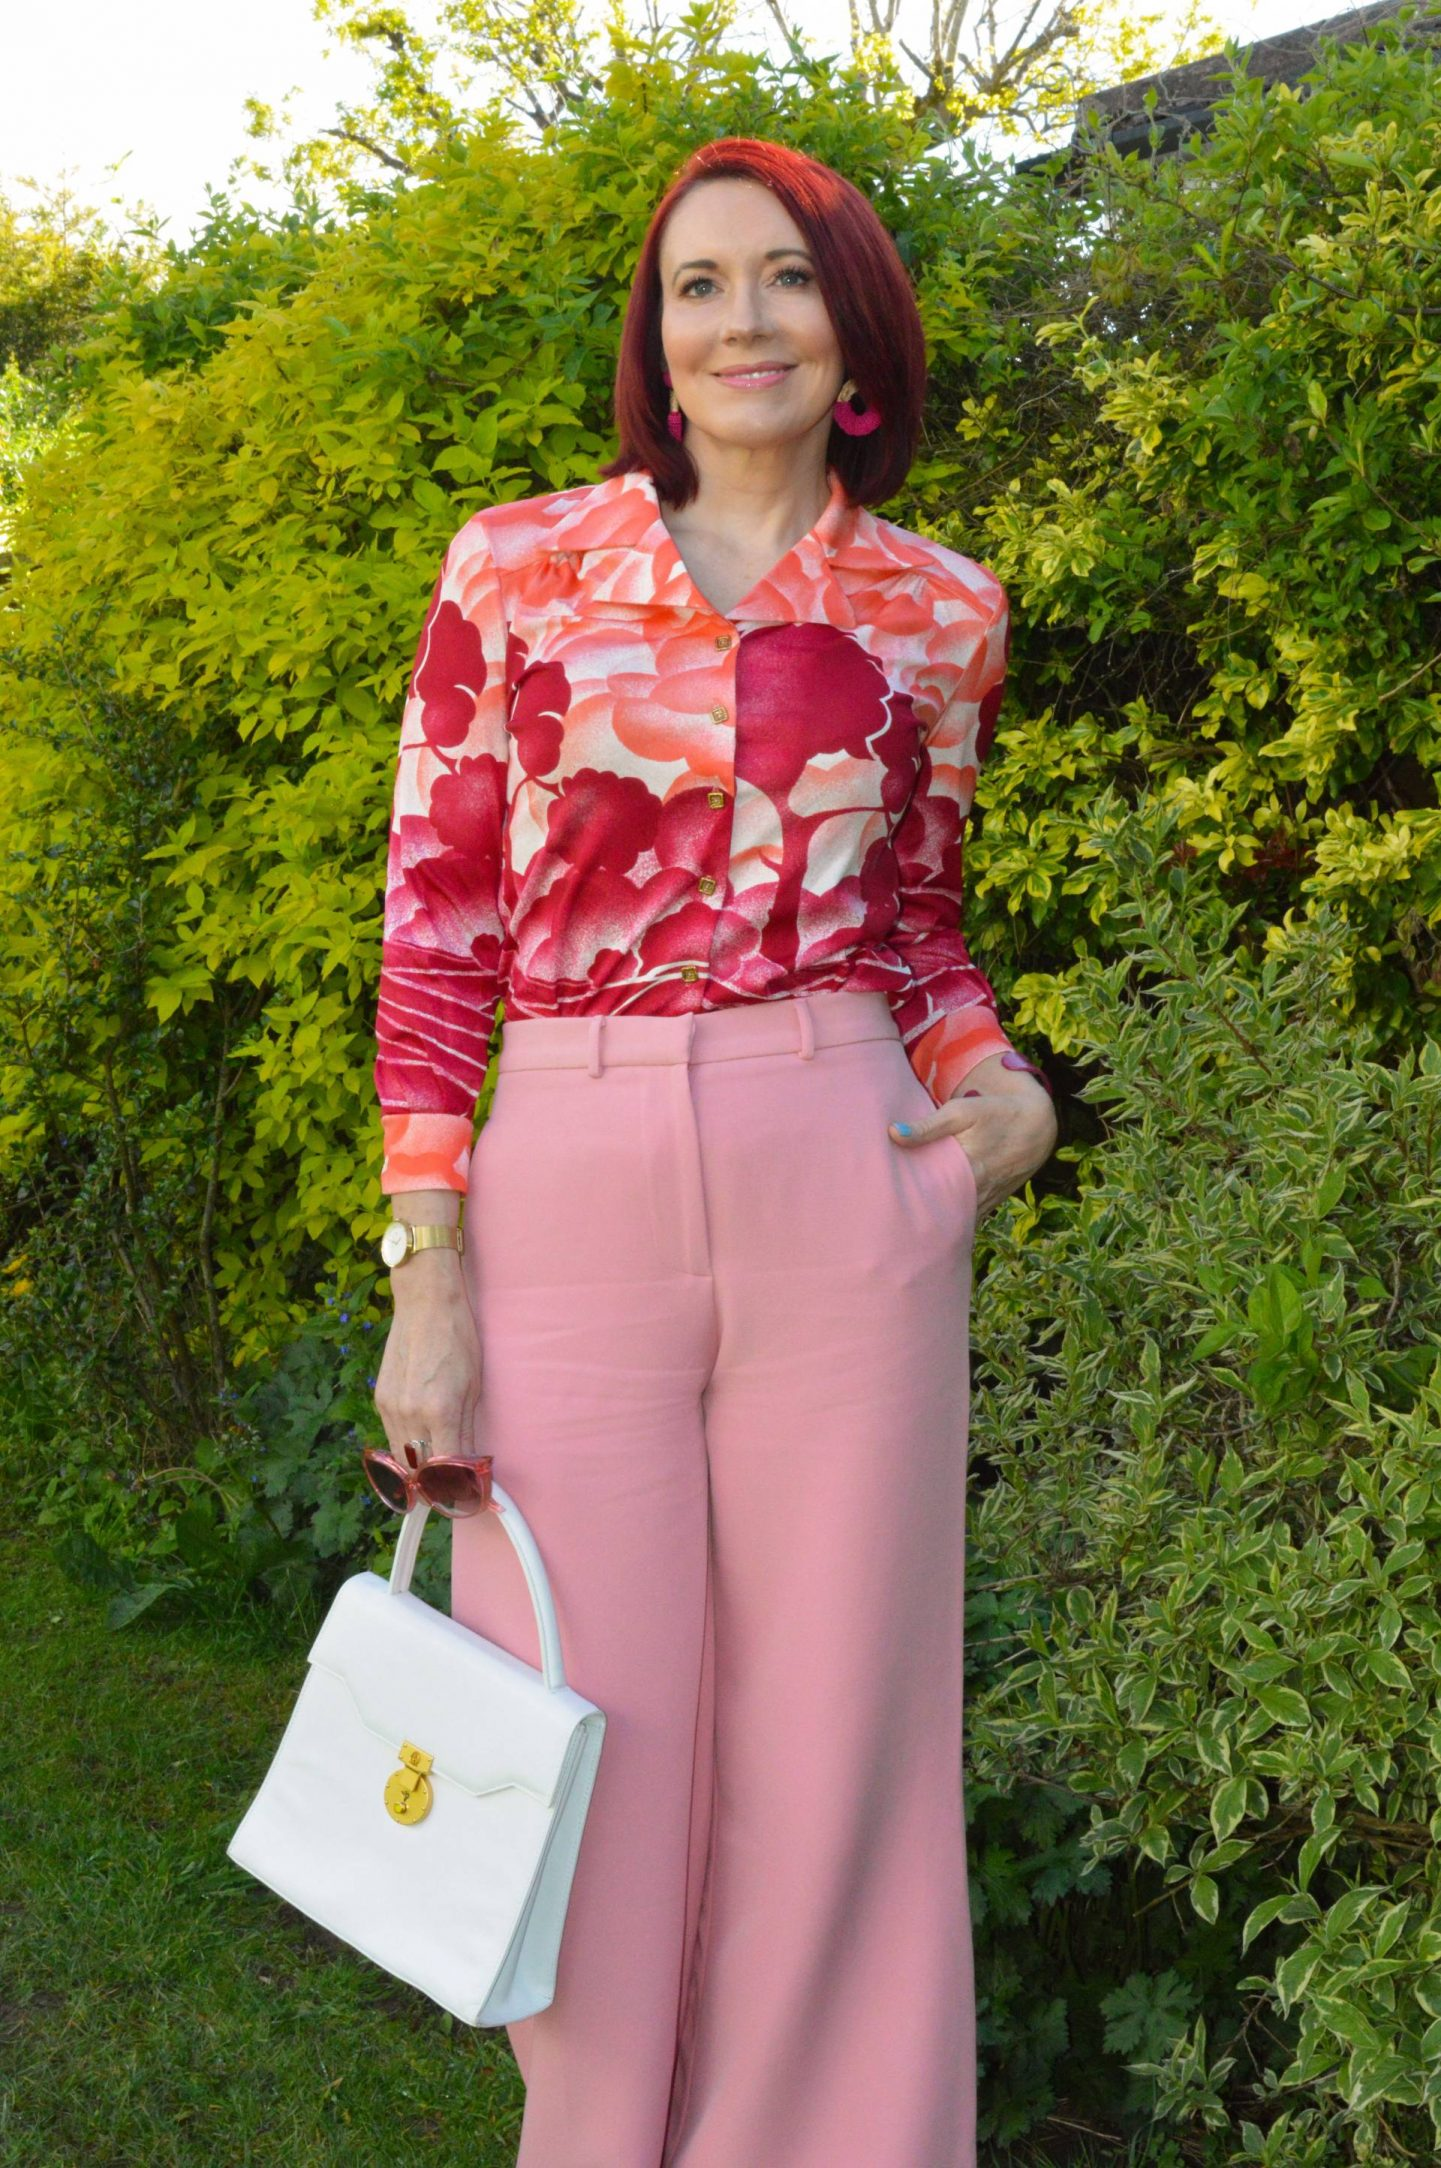 Vintage Shirt floral print shirt, white top handle handbag